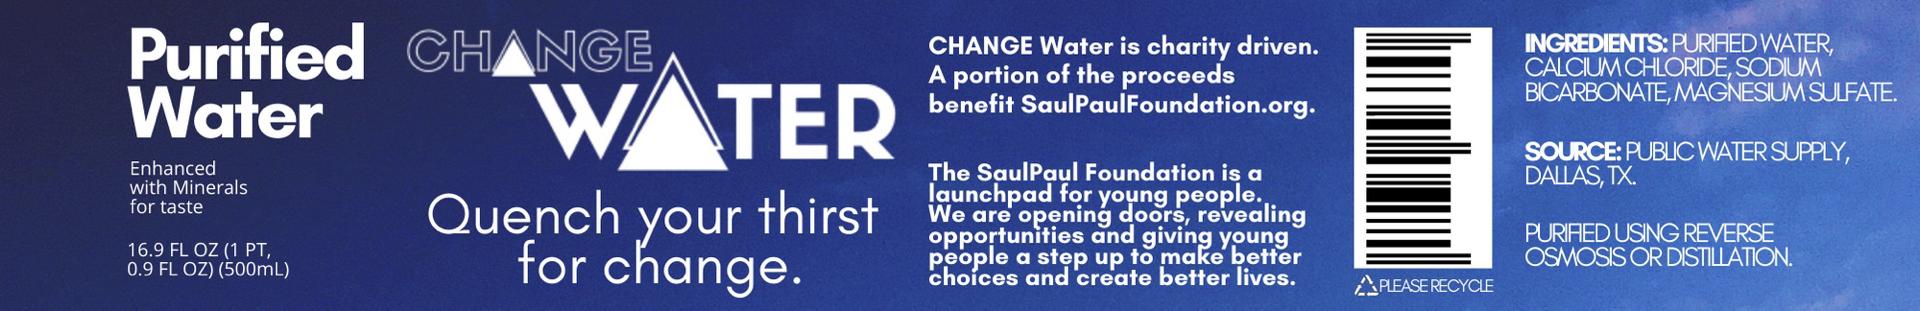 Change Water Banner